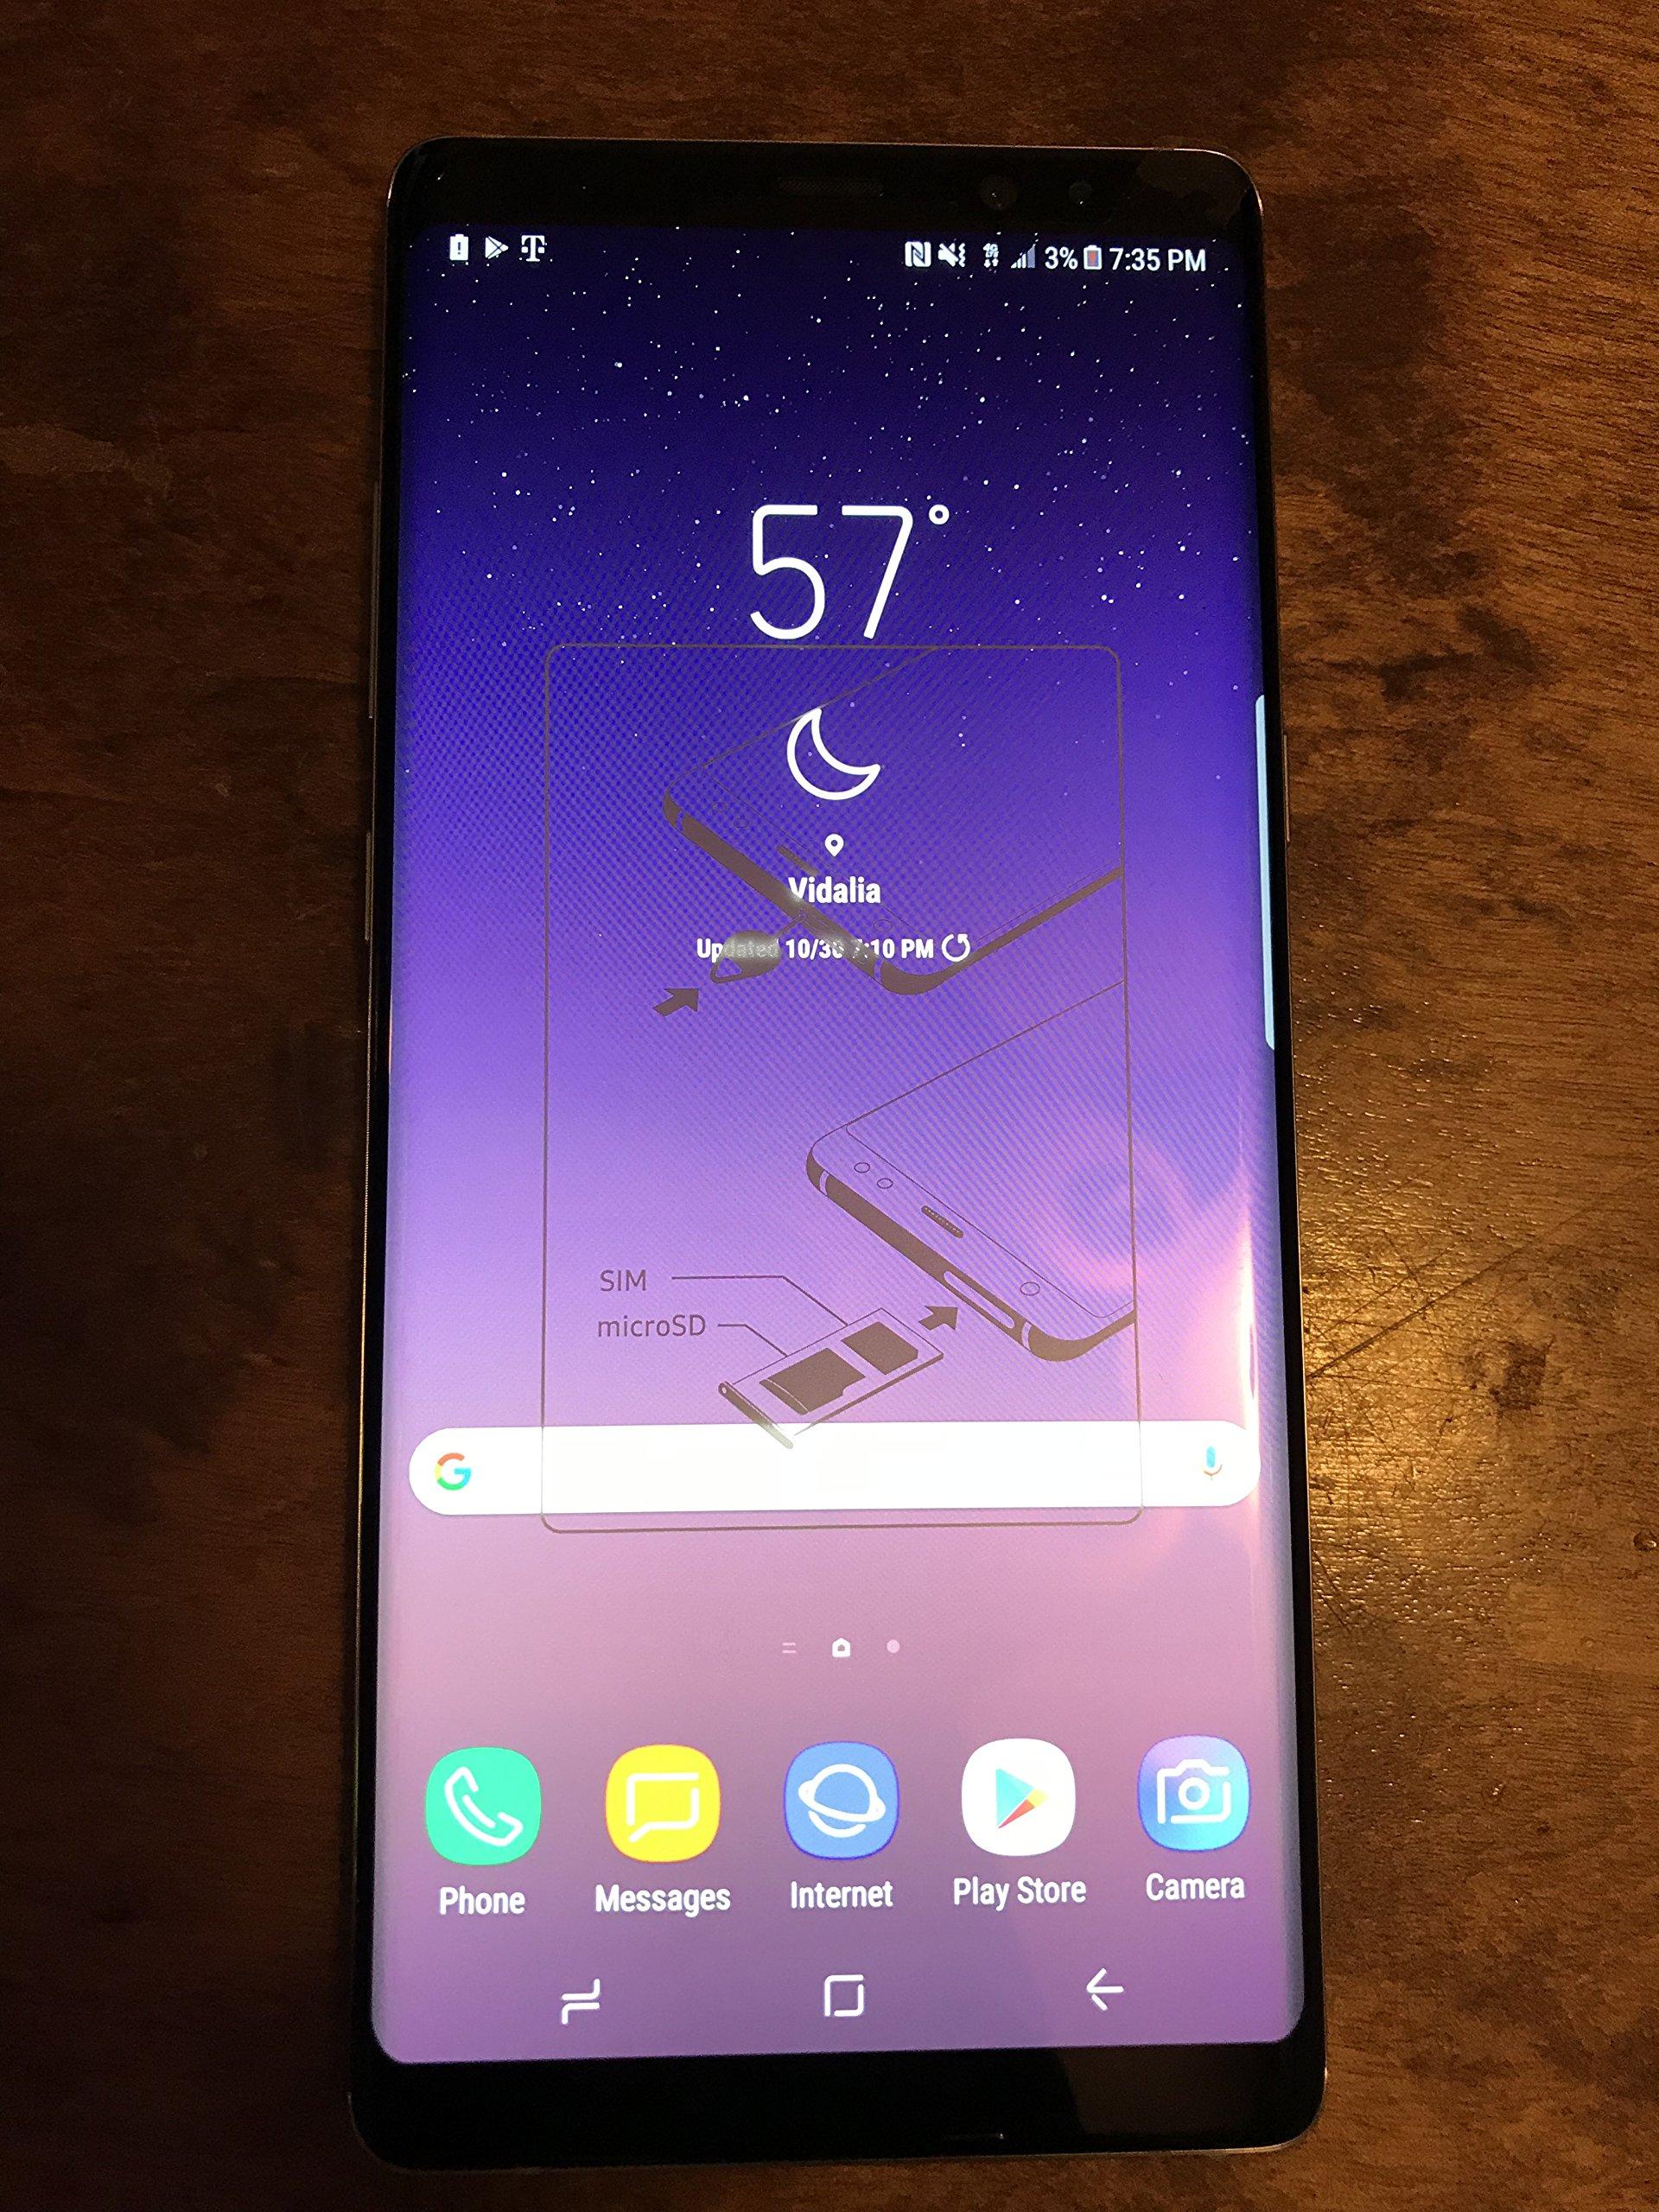 Samsung Galaxy Note 8 SM-N950U 64GB Midnight Black - T-Mobile